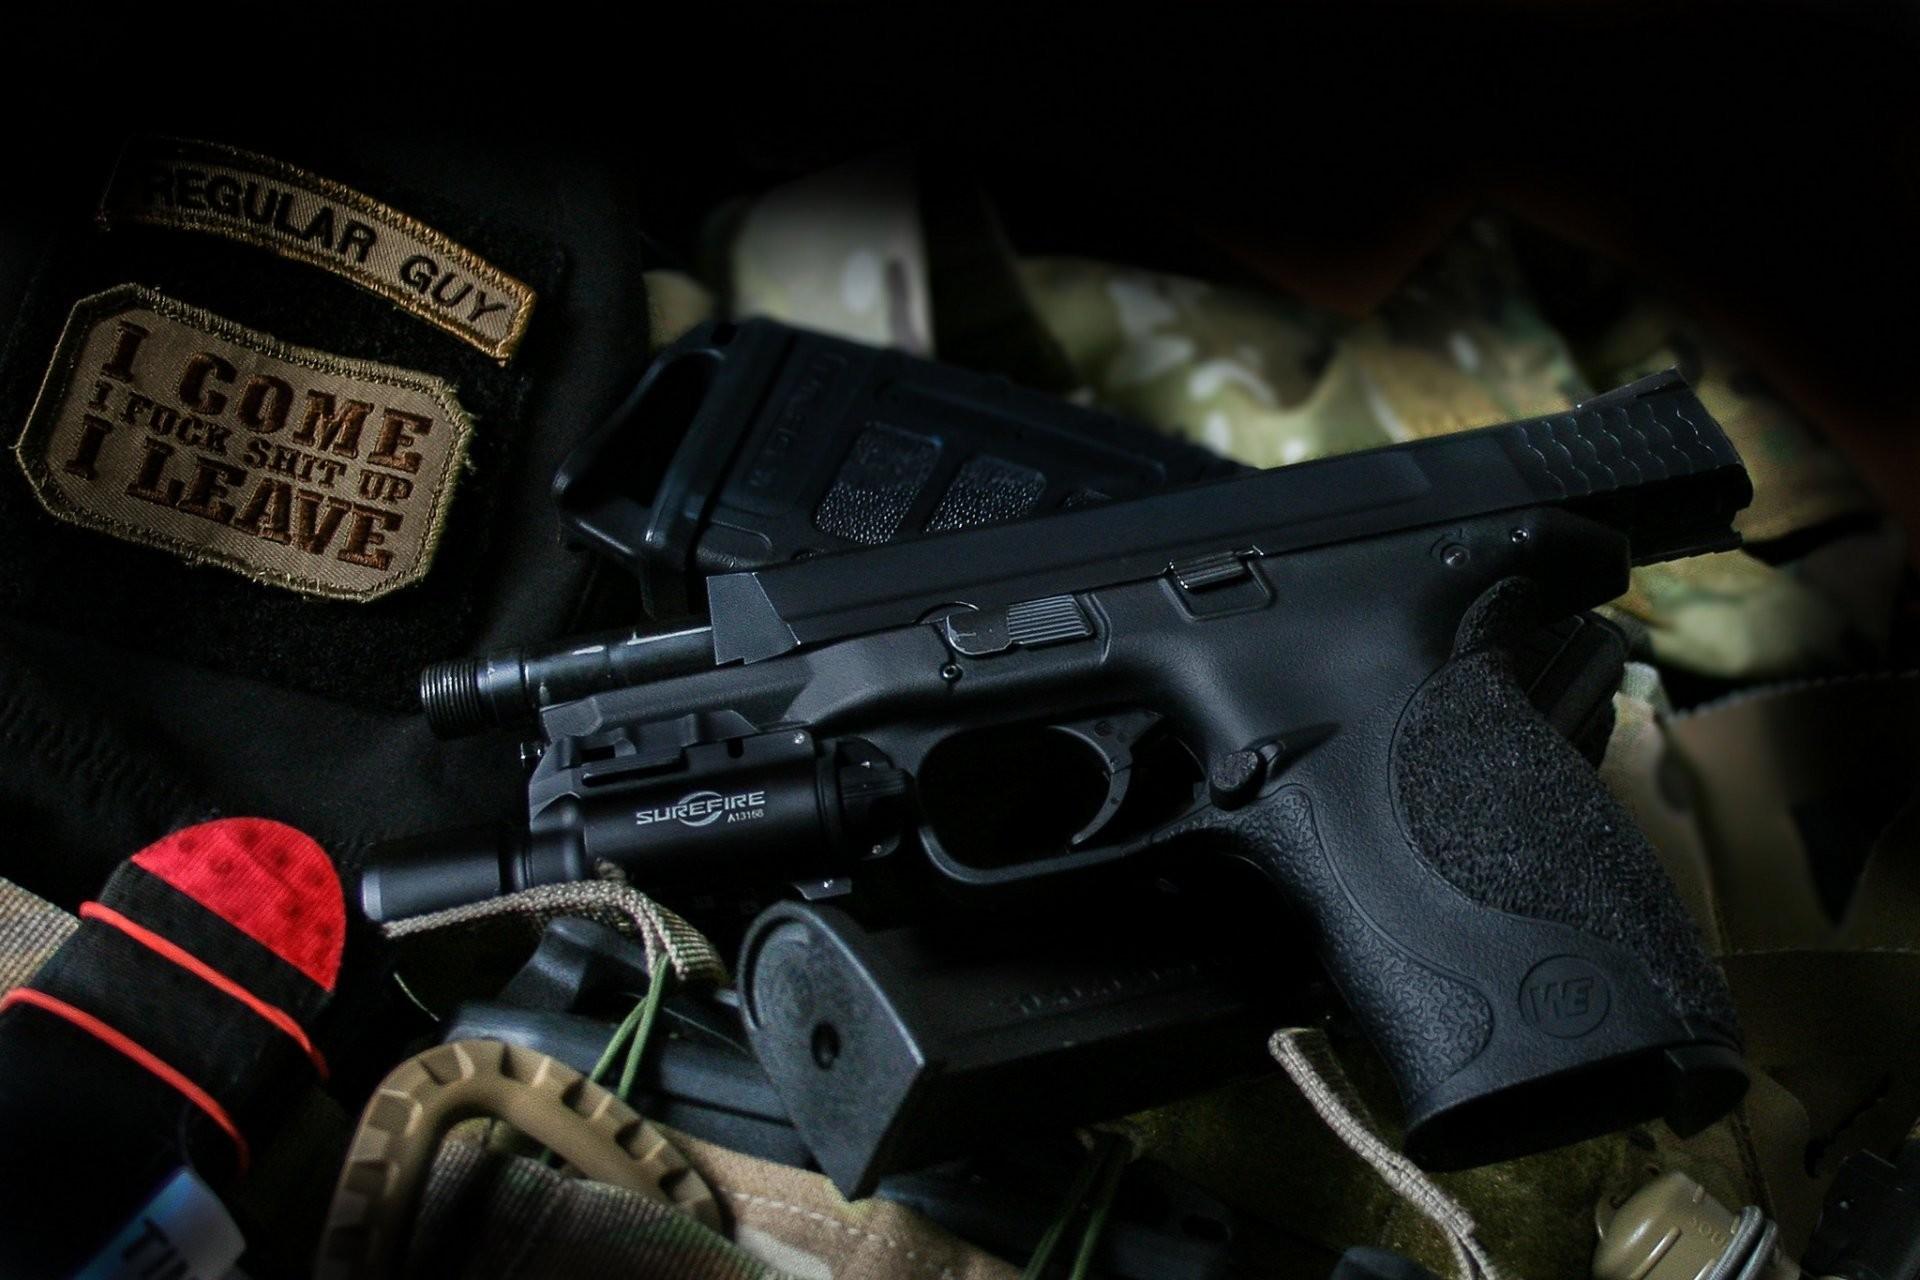 smith & wesson m&p9 gun flashlight weapon HD wallpaper